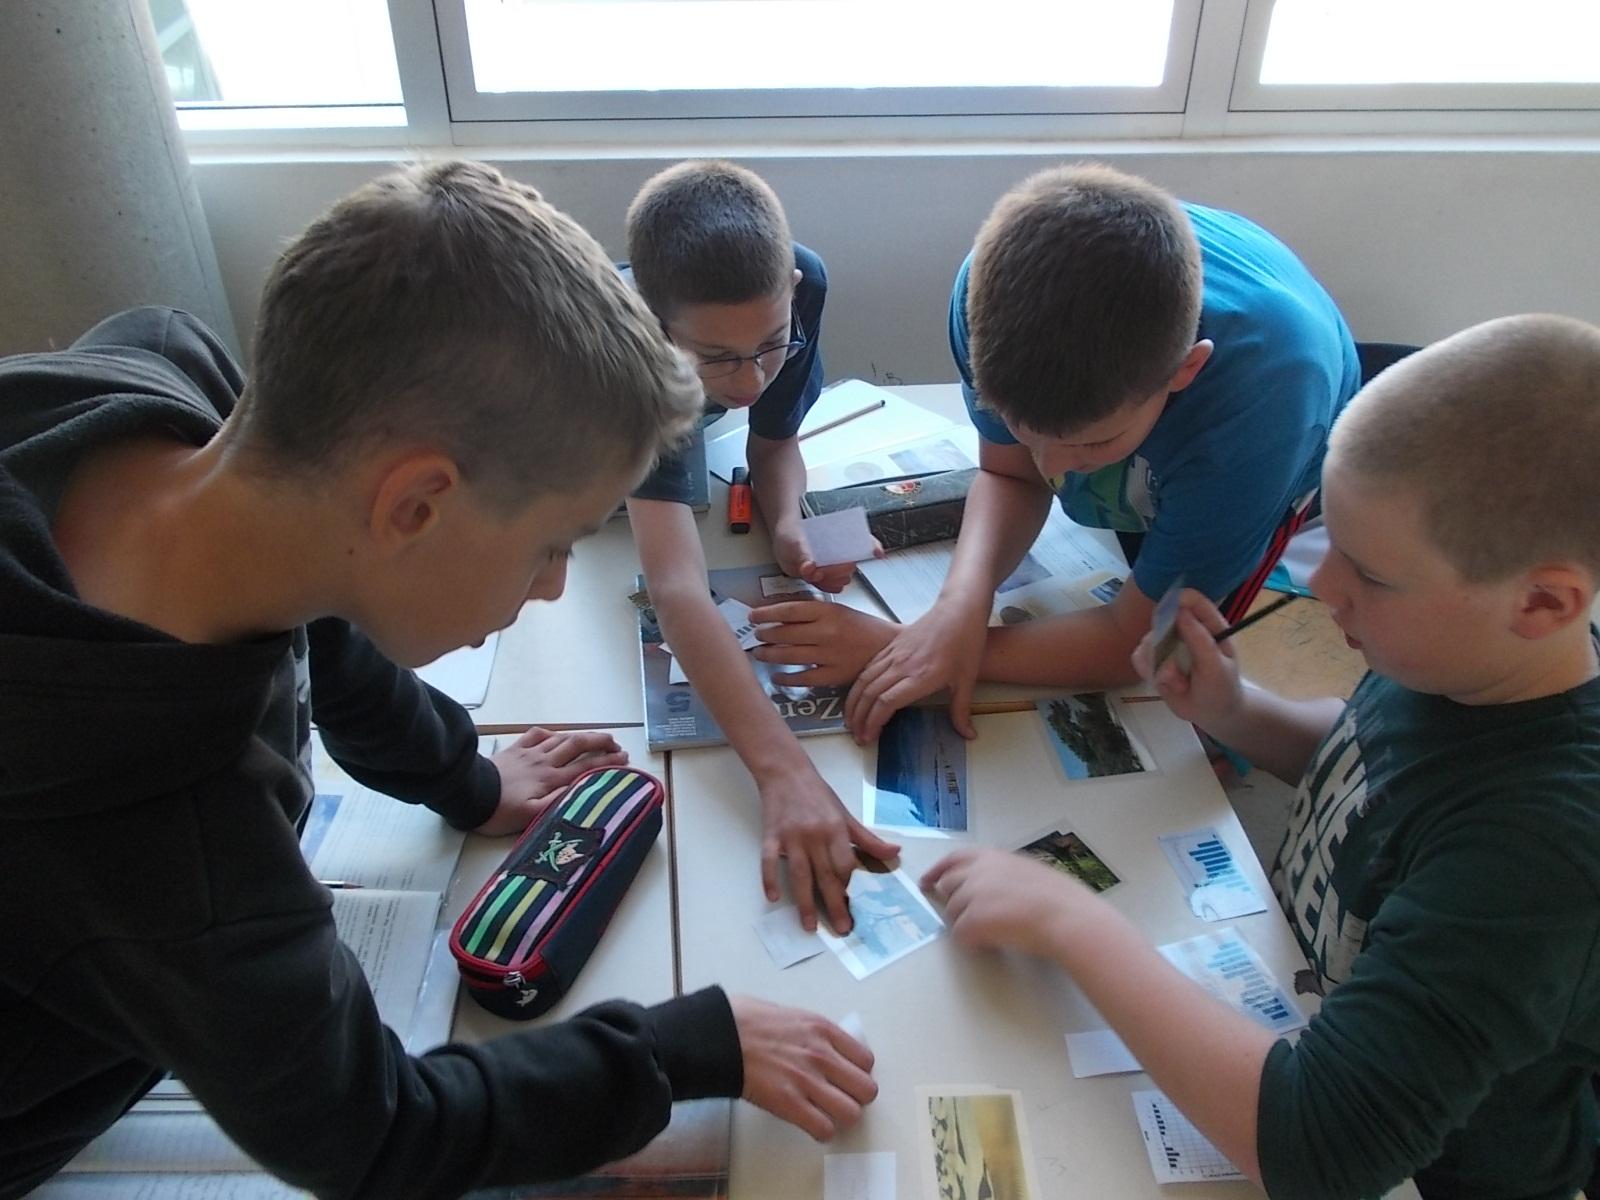 njemacki skolski sustav 009